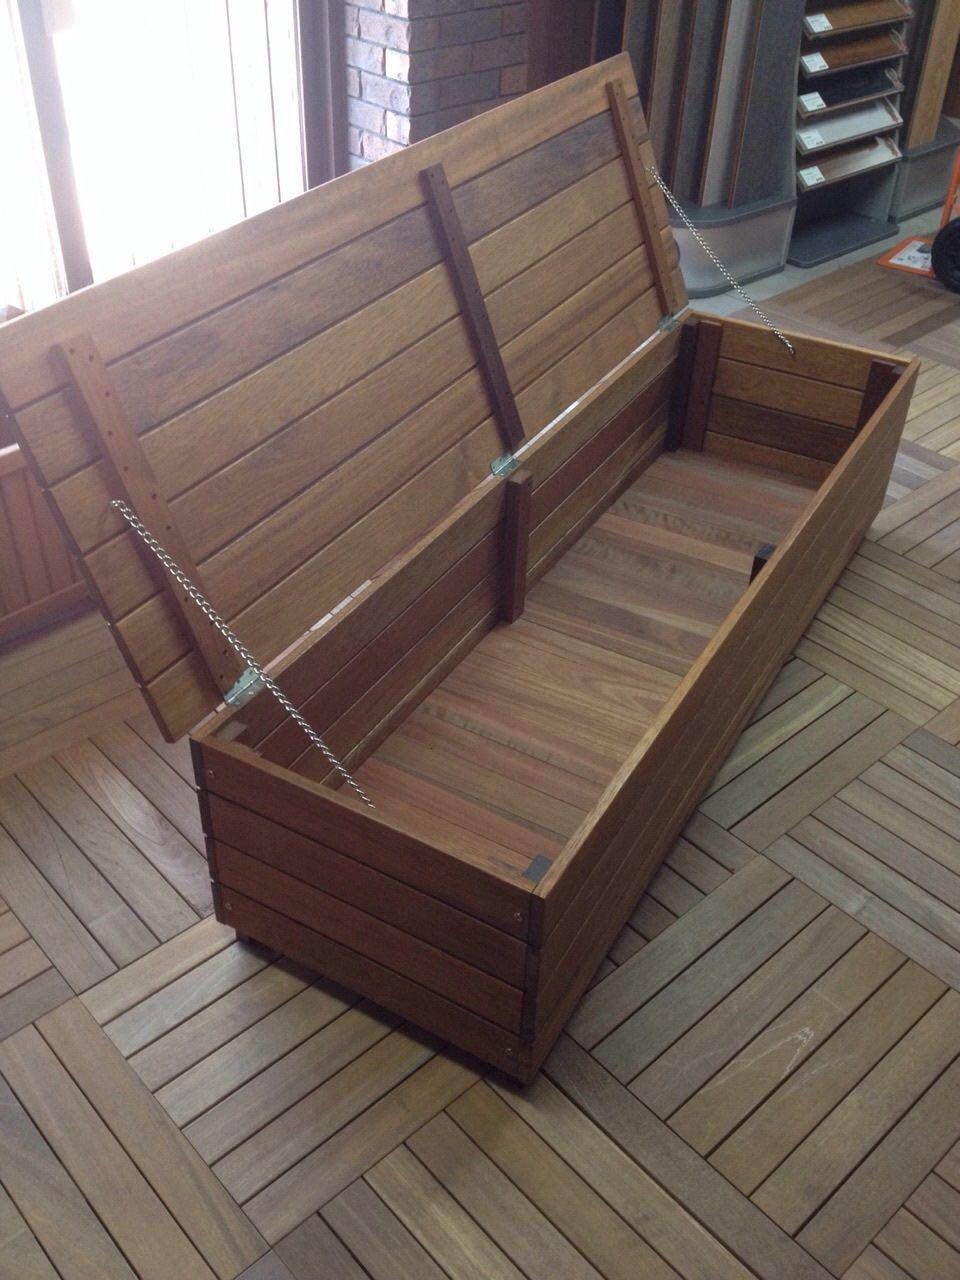 10 Charming Diy Outdoor Storage Ideas Wooden Storage Bench Storage Bench Seating Diy Bench Outdoor